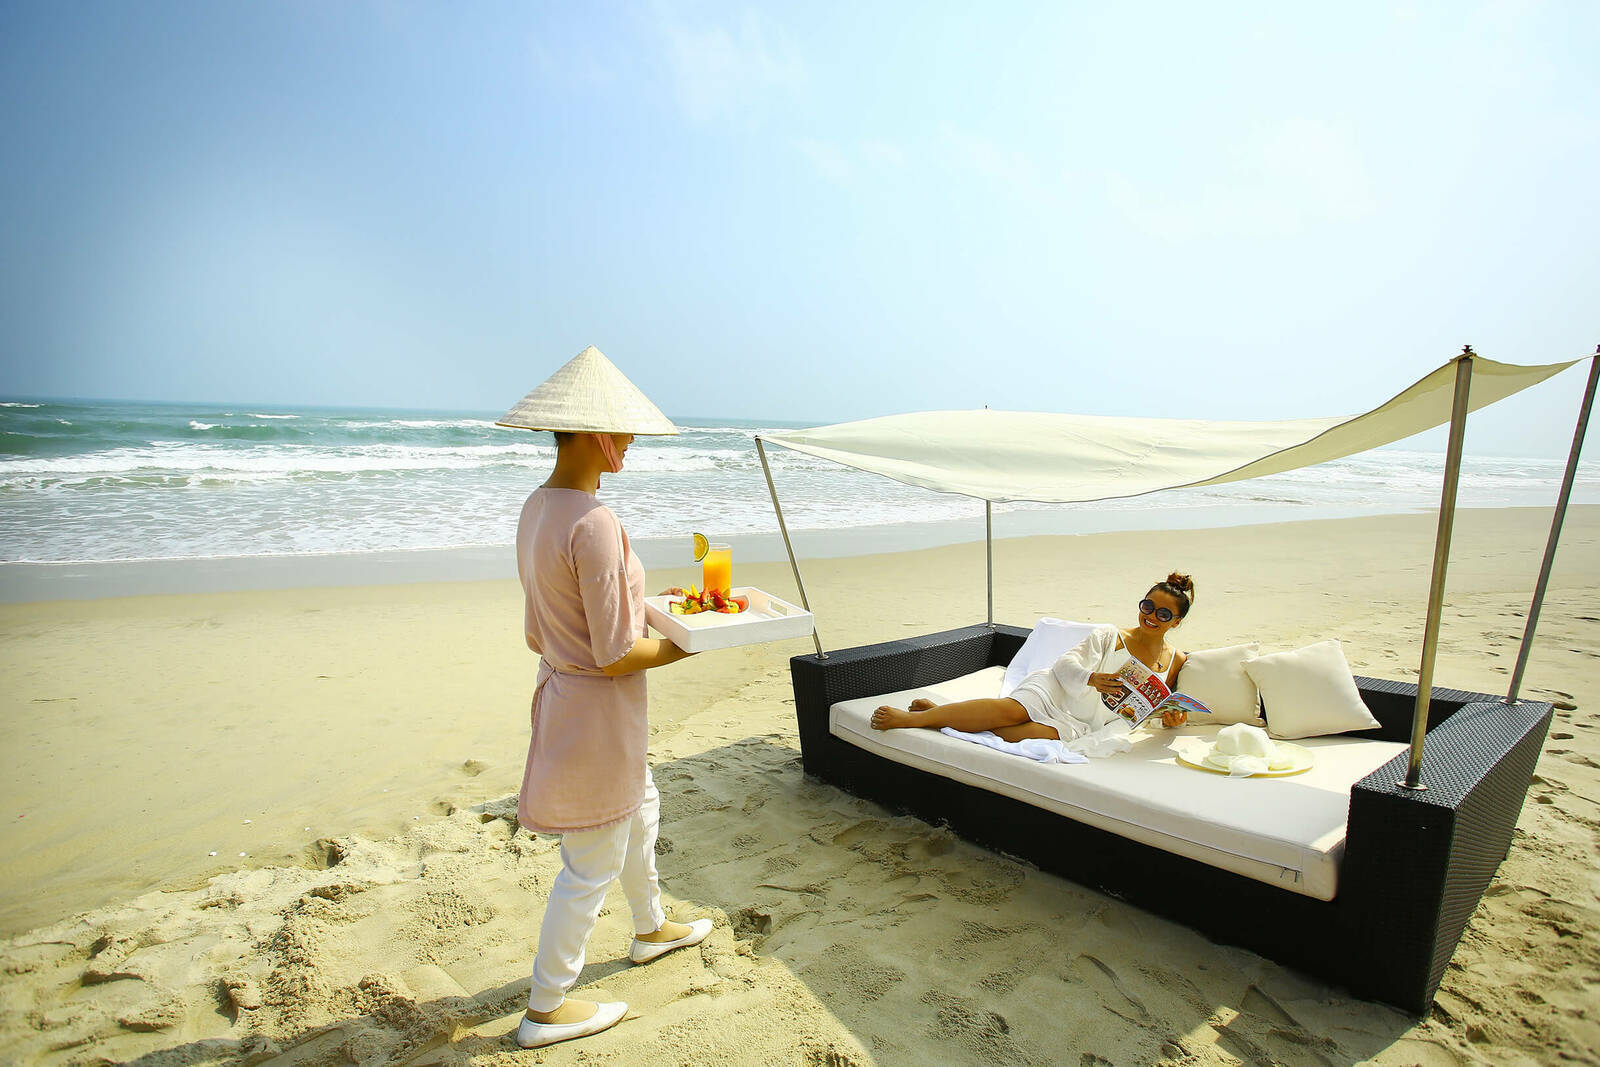 7 Daybed breakfast 6 8730 1585197606 - 6 resort của Việt Nam lên báo Anh